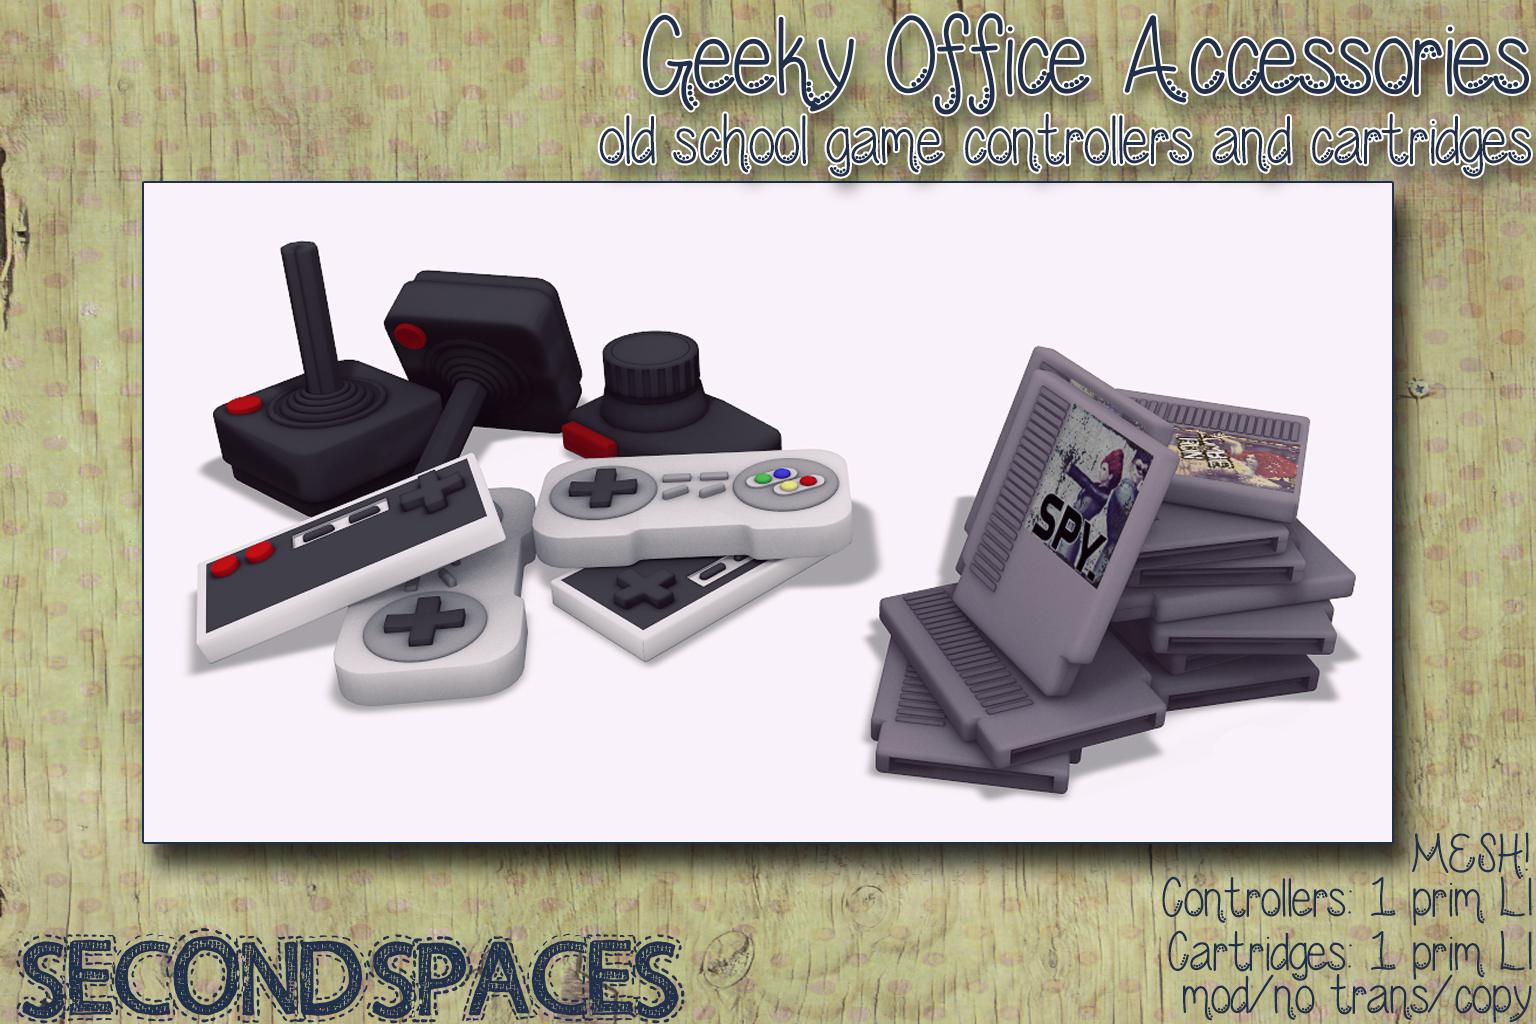 geeky office accessories_controllers cartridges_vendor.jpg